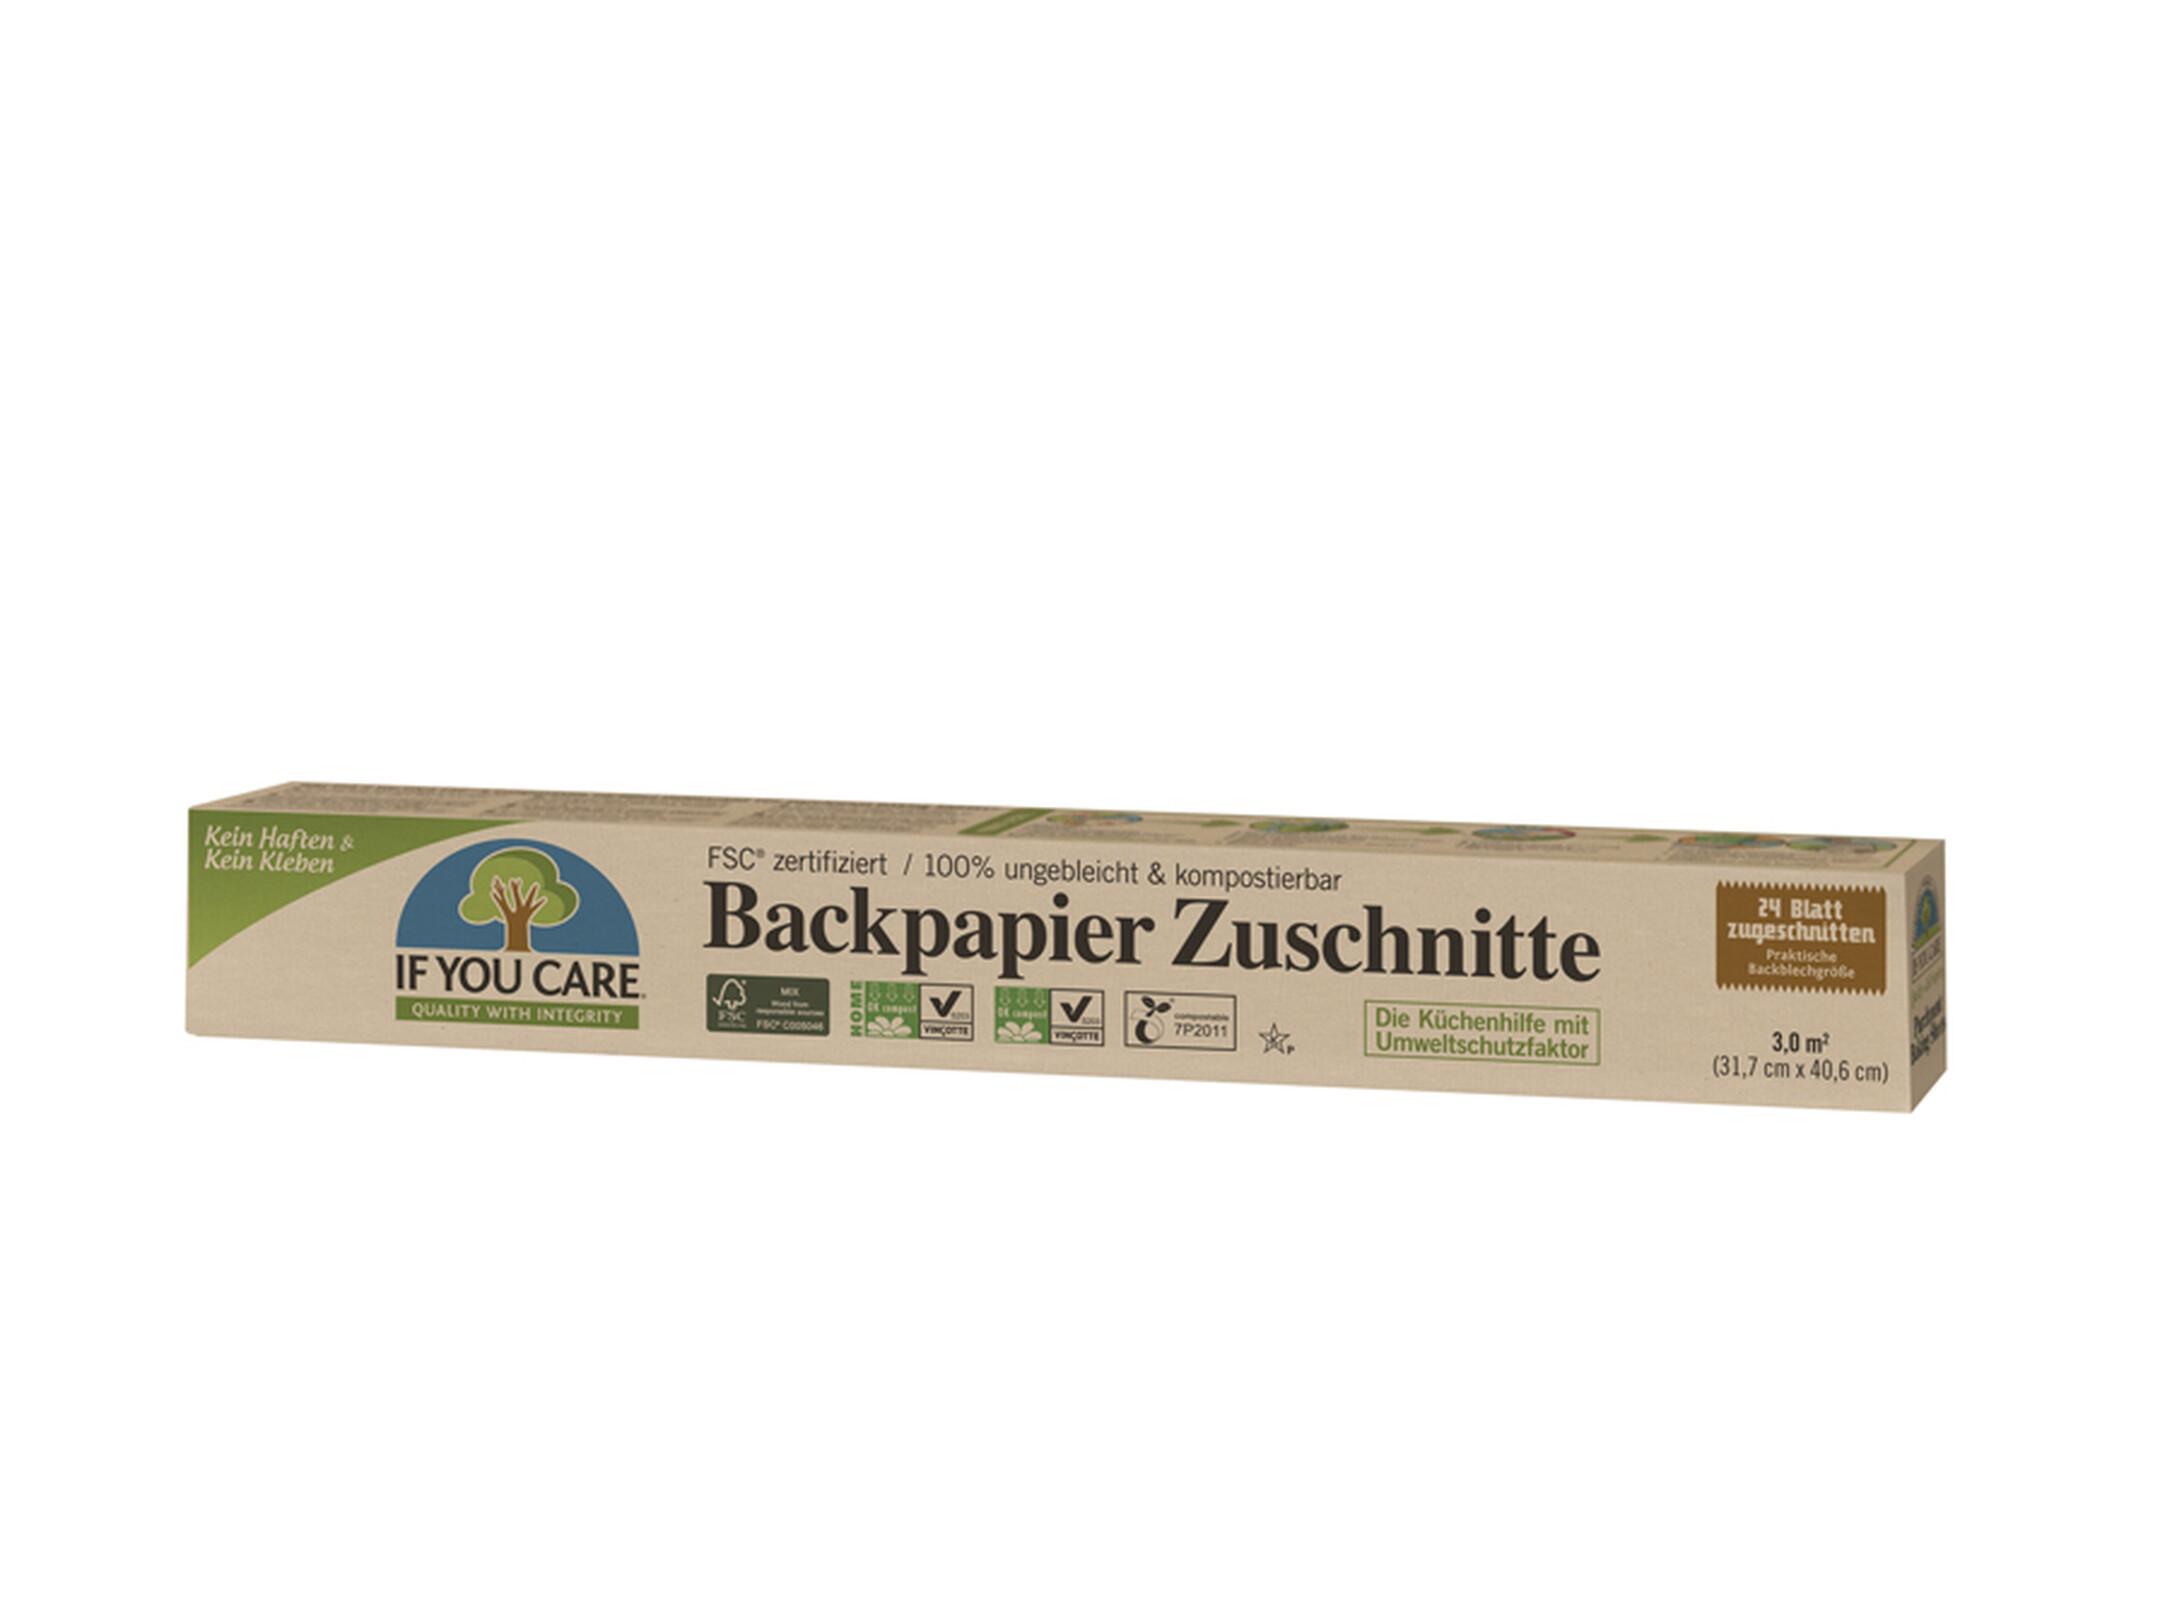 backpapier zuschnitt kompostierbar online shop. Black Bedroom Furniture Sets. Home Design Ideas